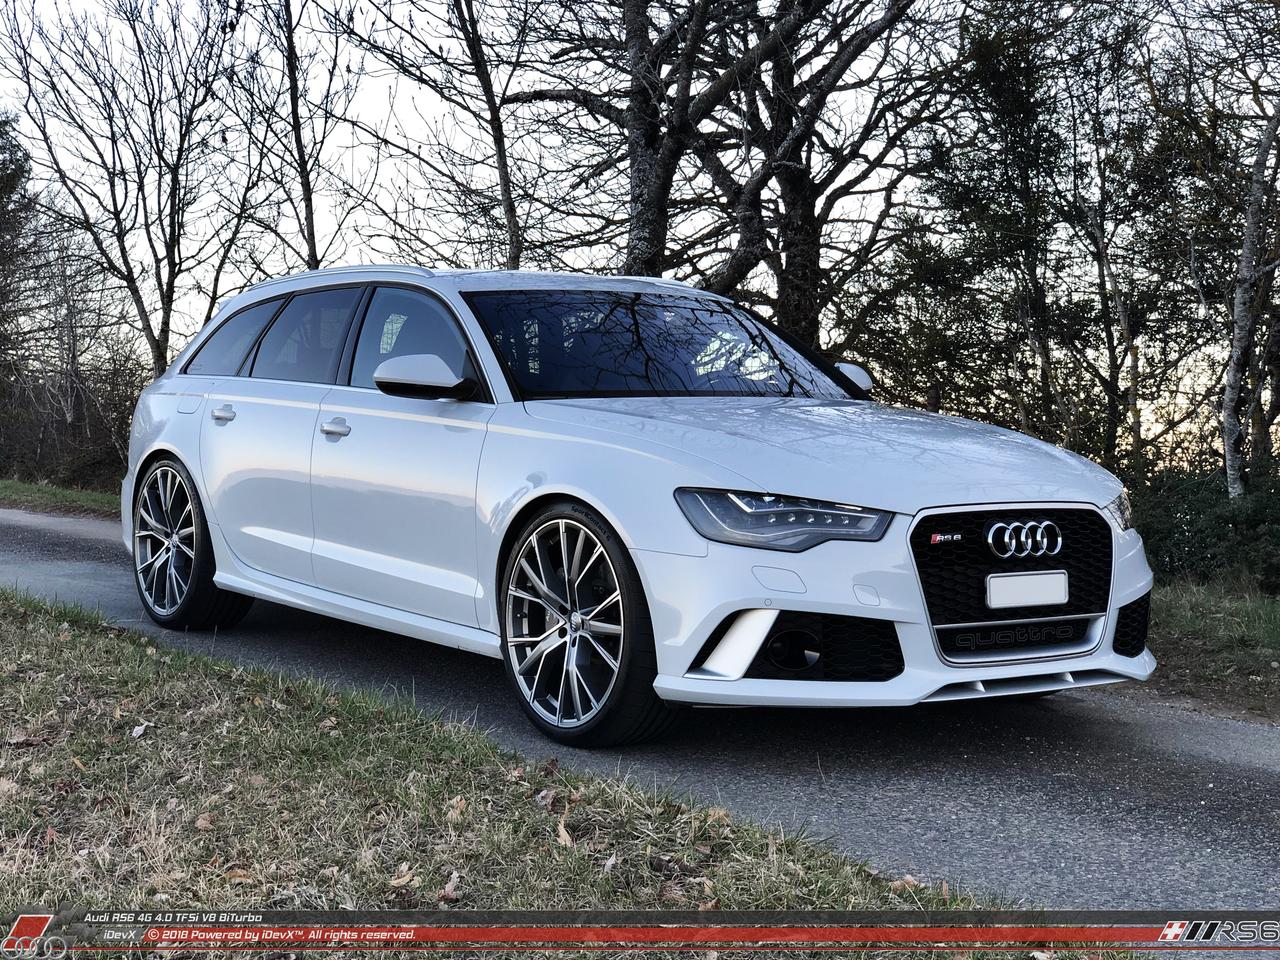 22_02.2019_Audi-RS6_iDevX_003.png